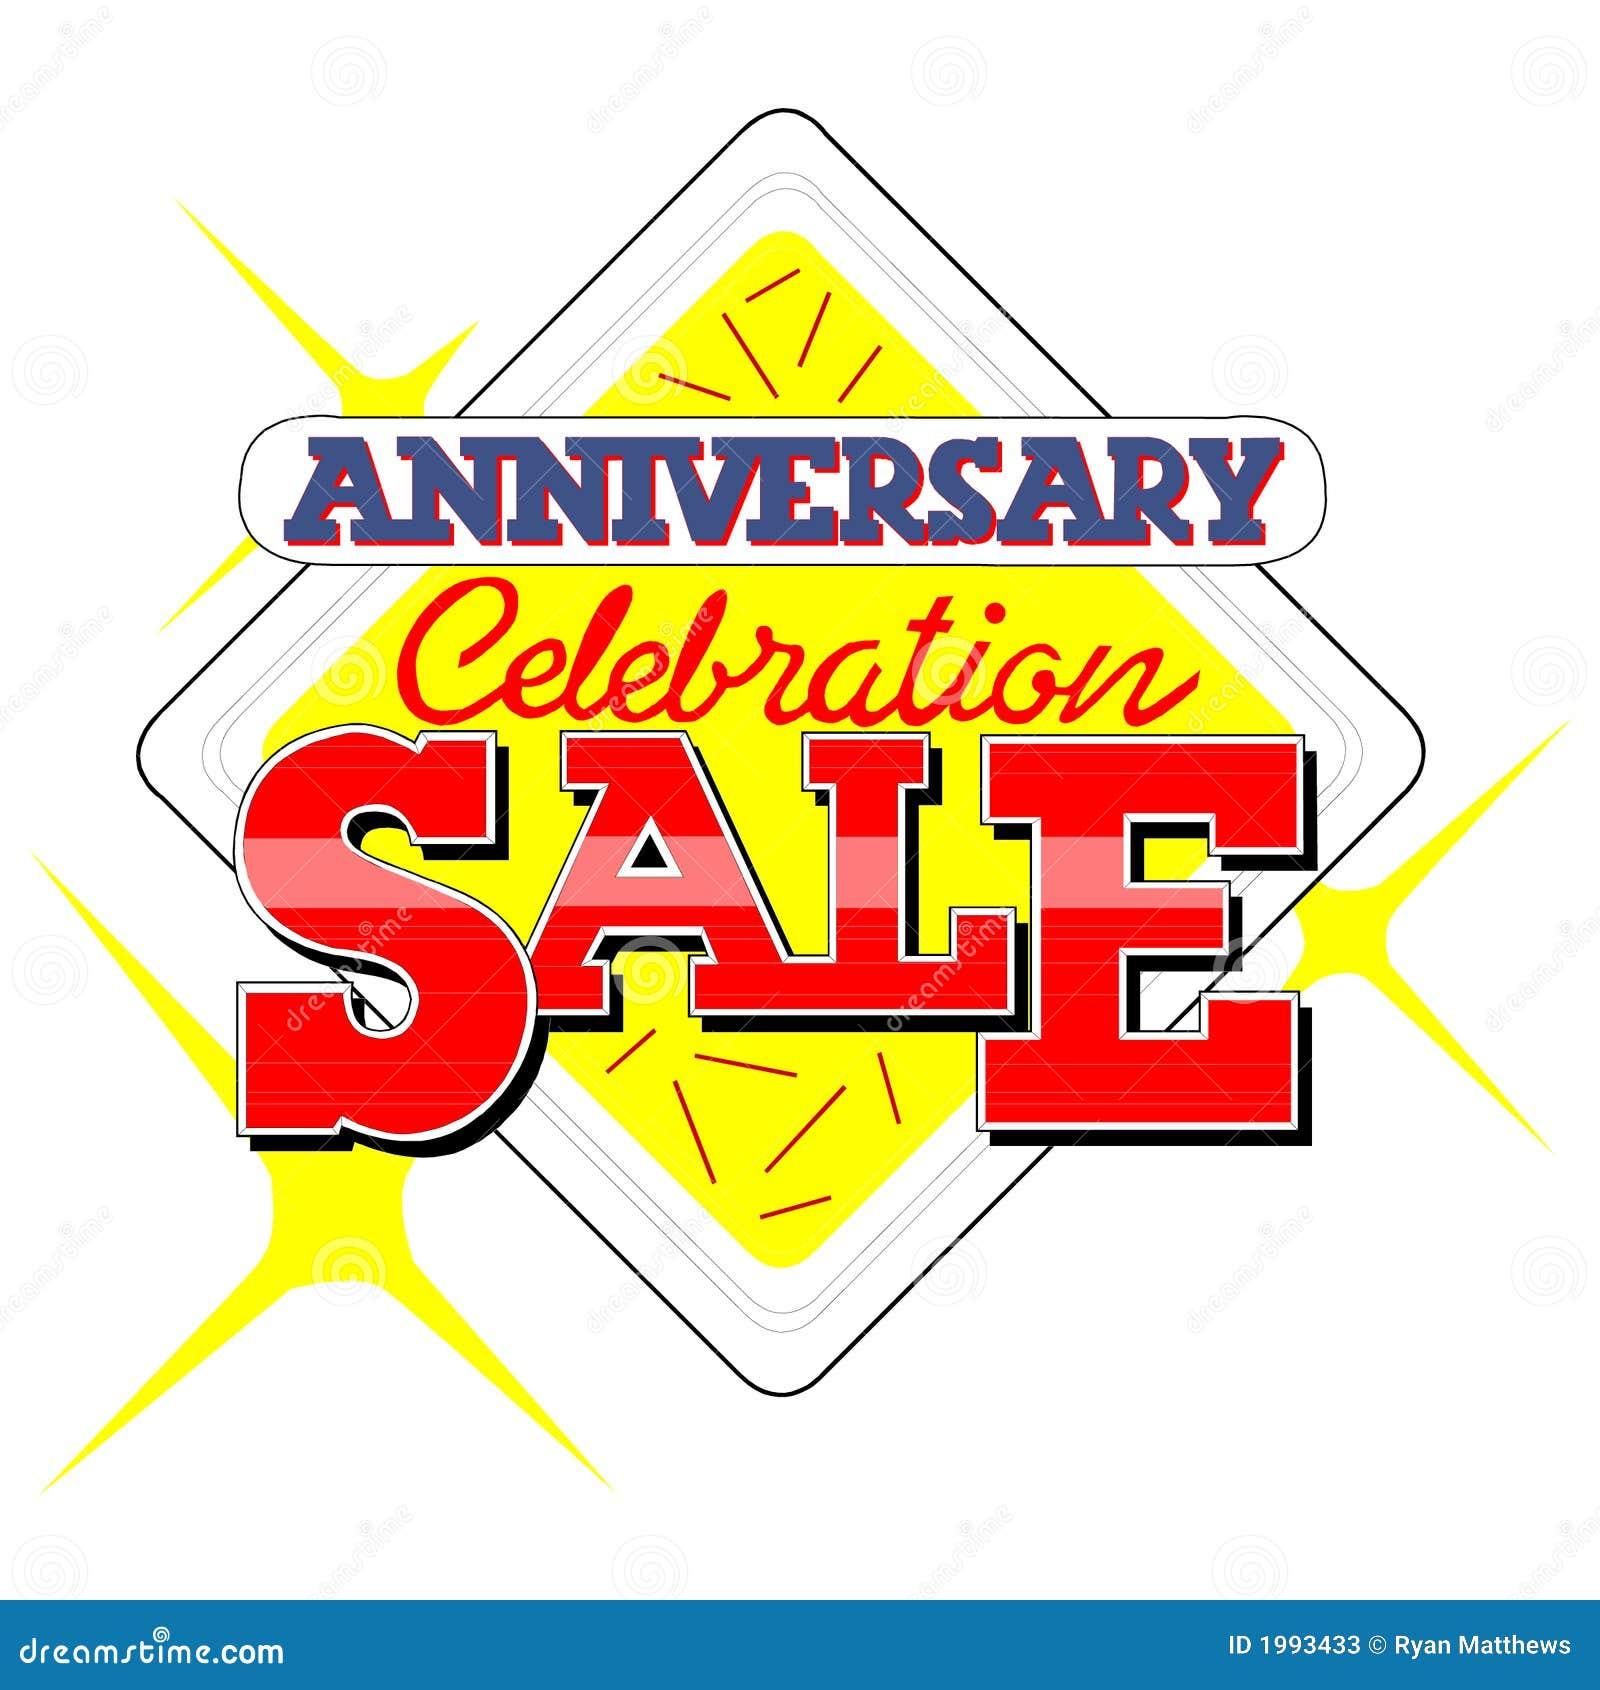 Anniversary sale heading stock photos image